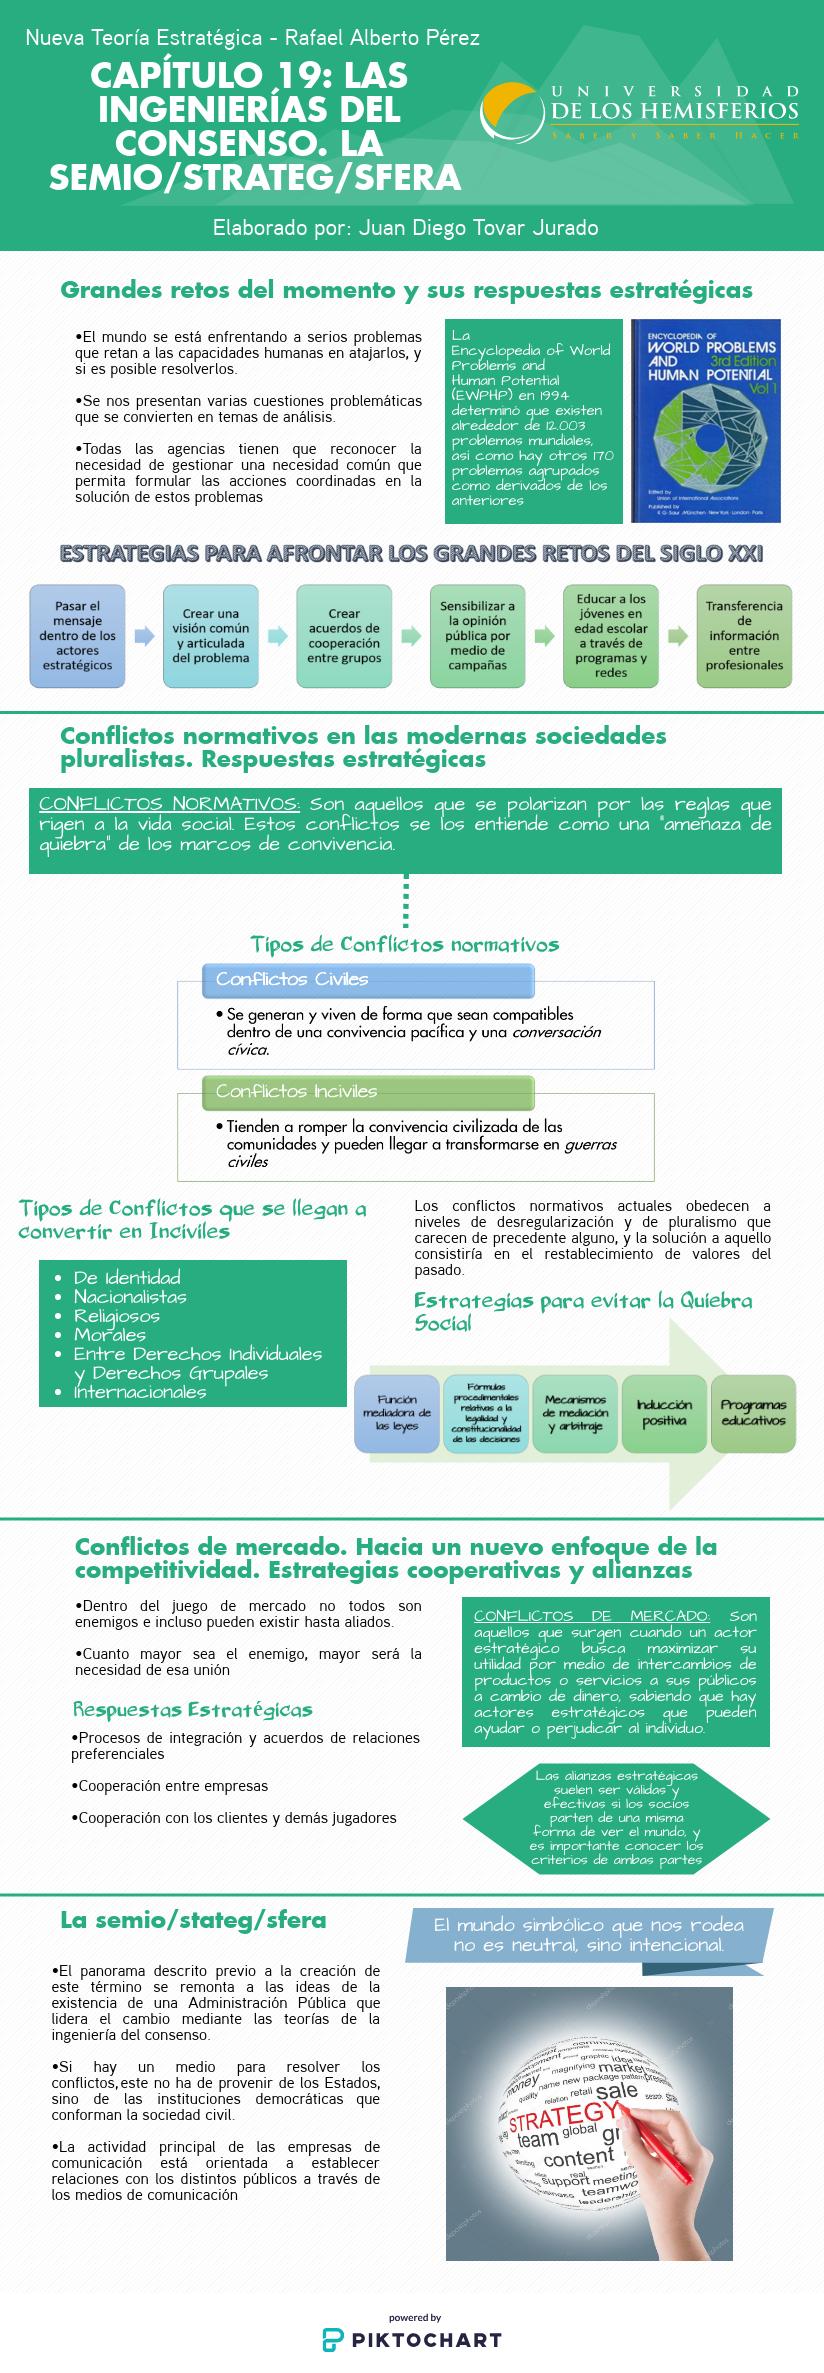 CAPITULO 19 Infografia - Juan Diego Tovar.png